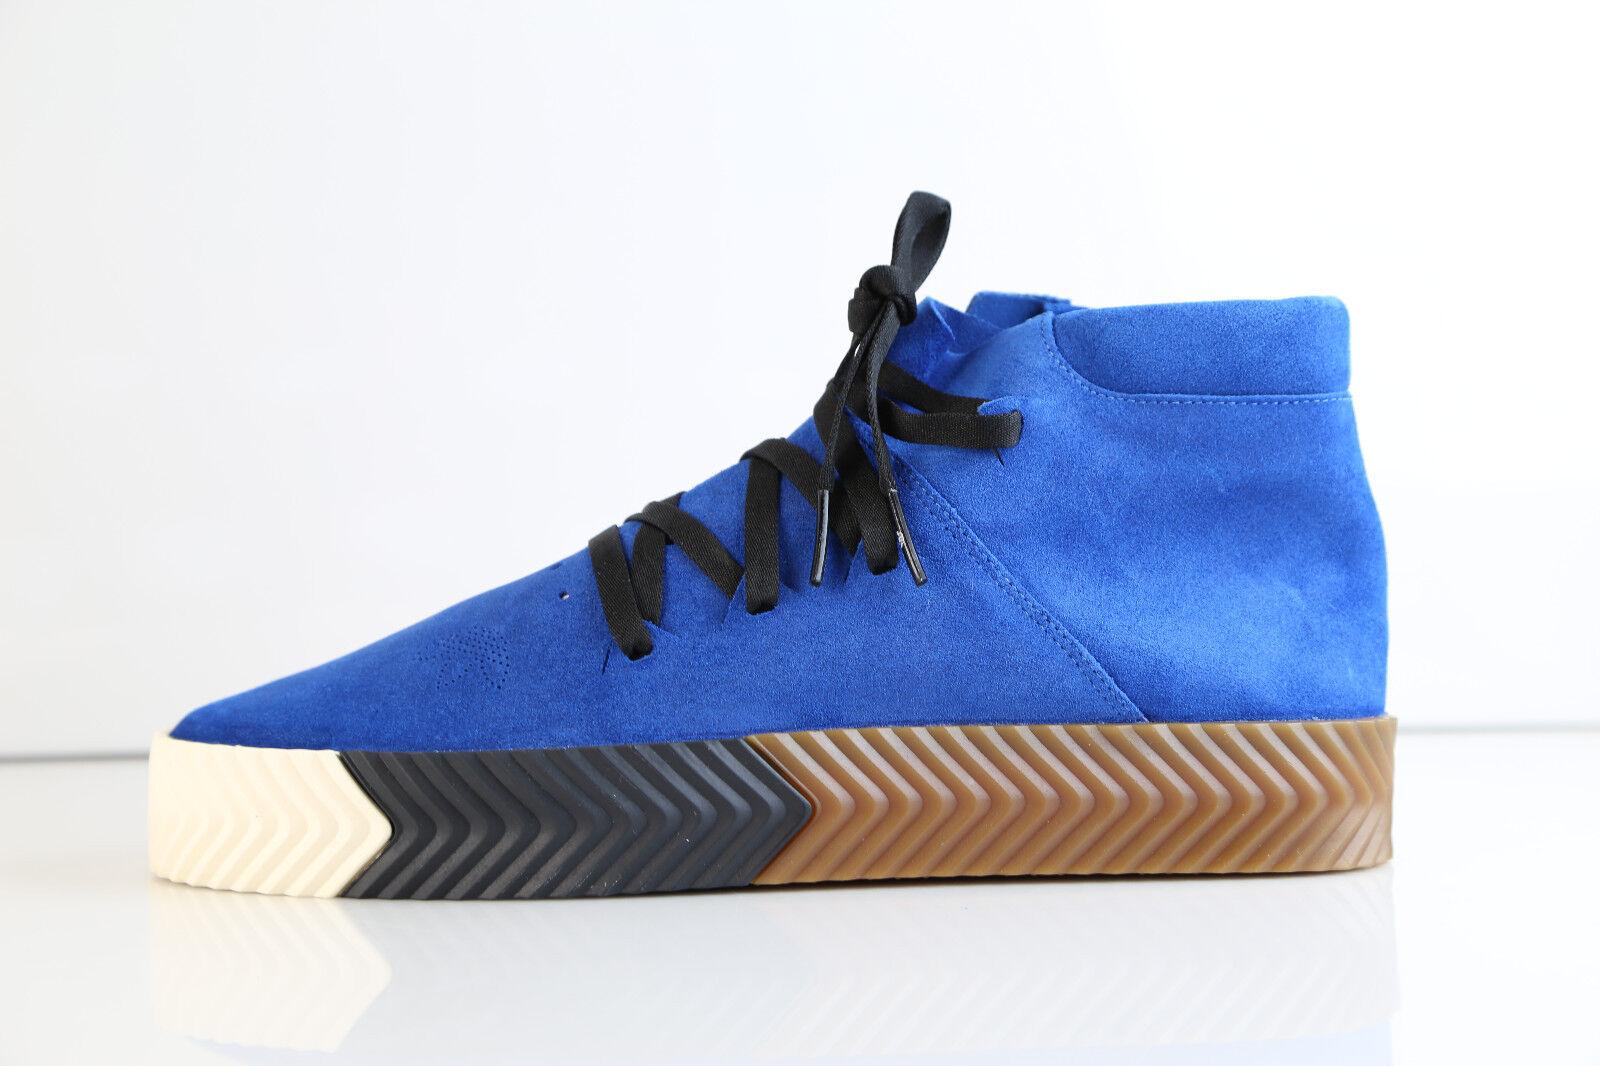 Adidas Alexander Wang AW Skate Mid Bluebird Gum AC6849 8-12.5 blue suede